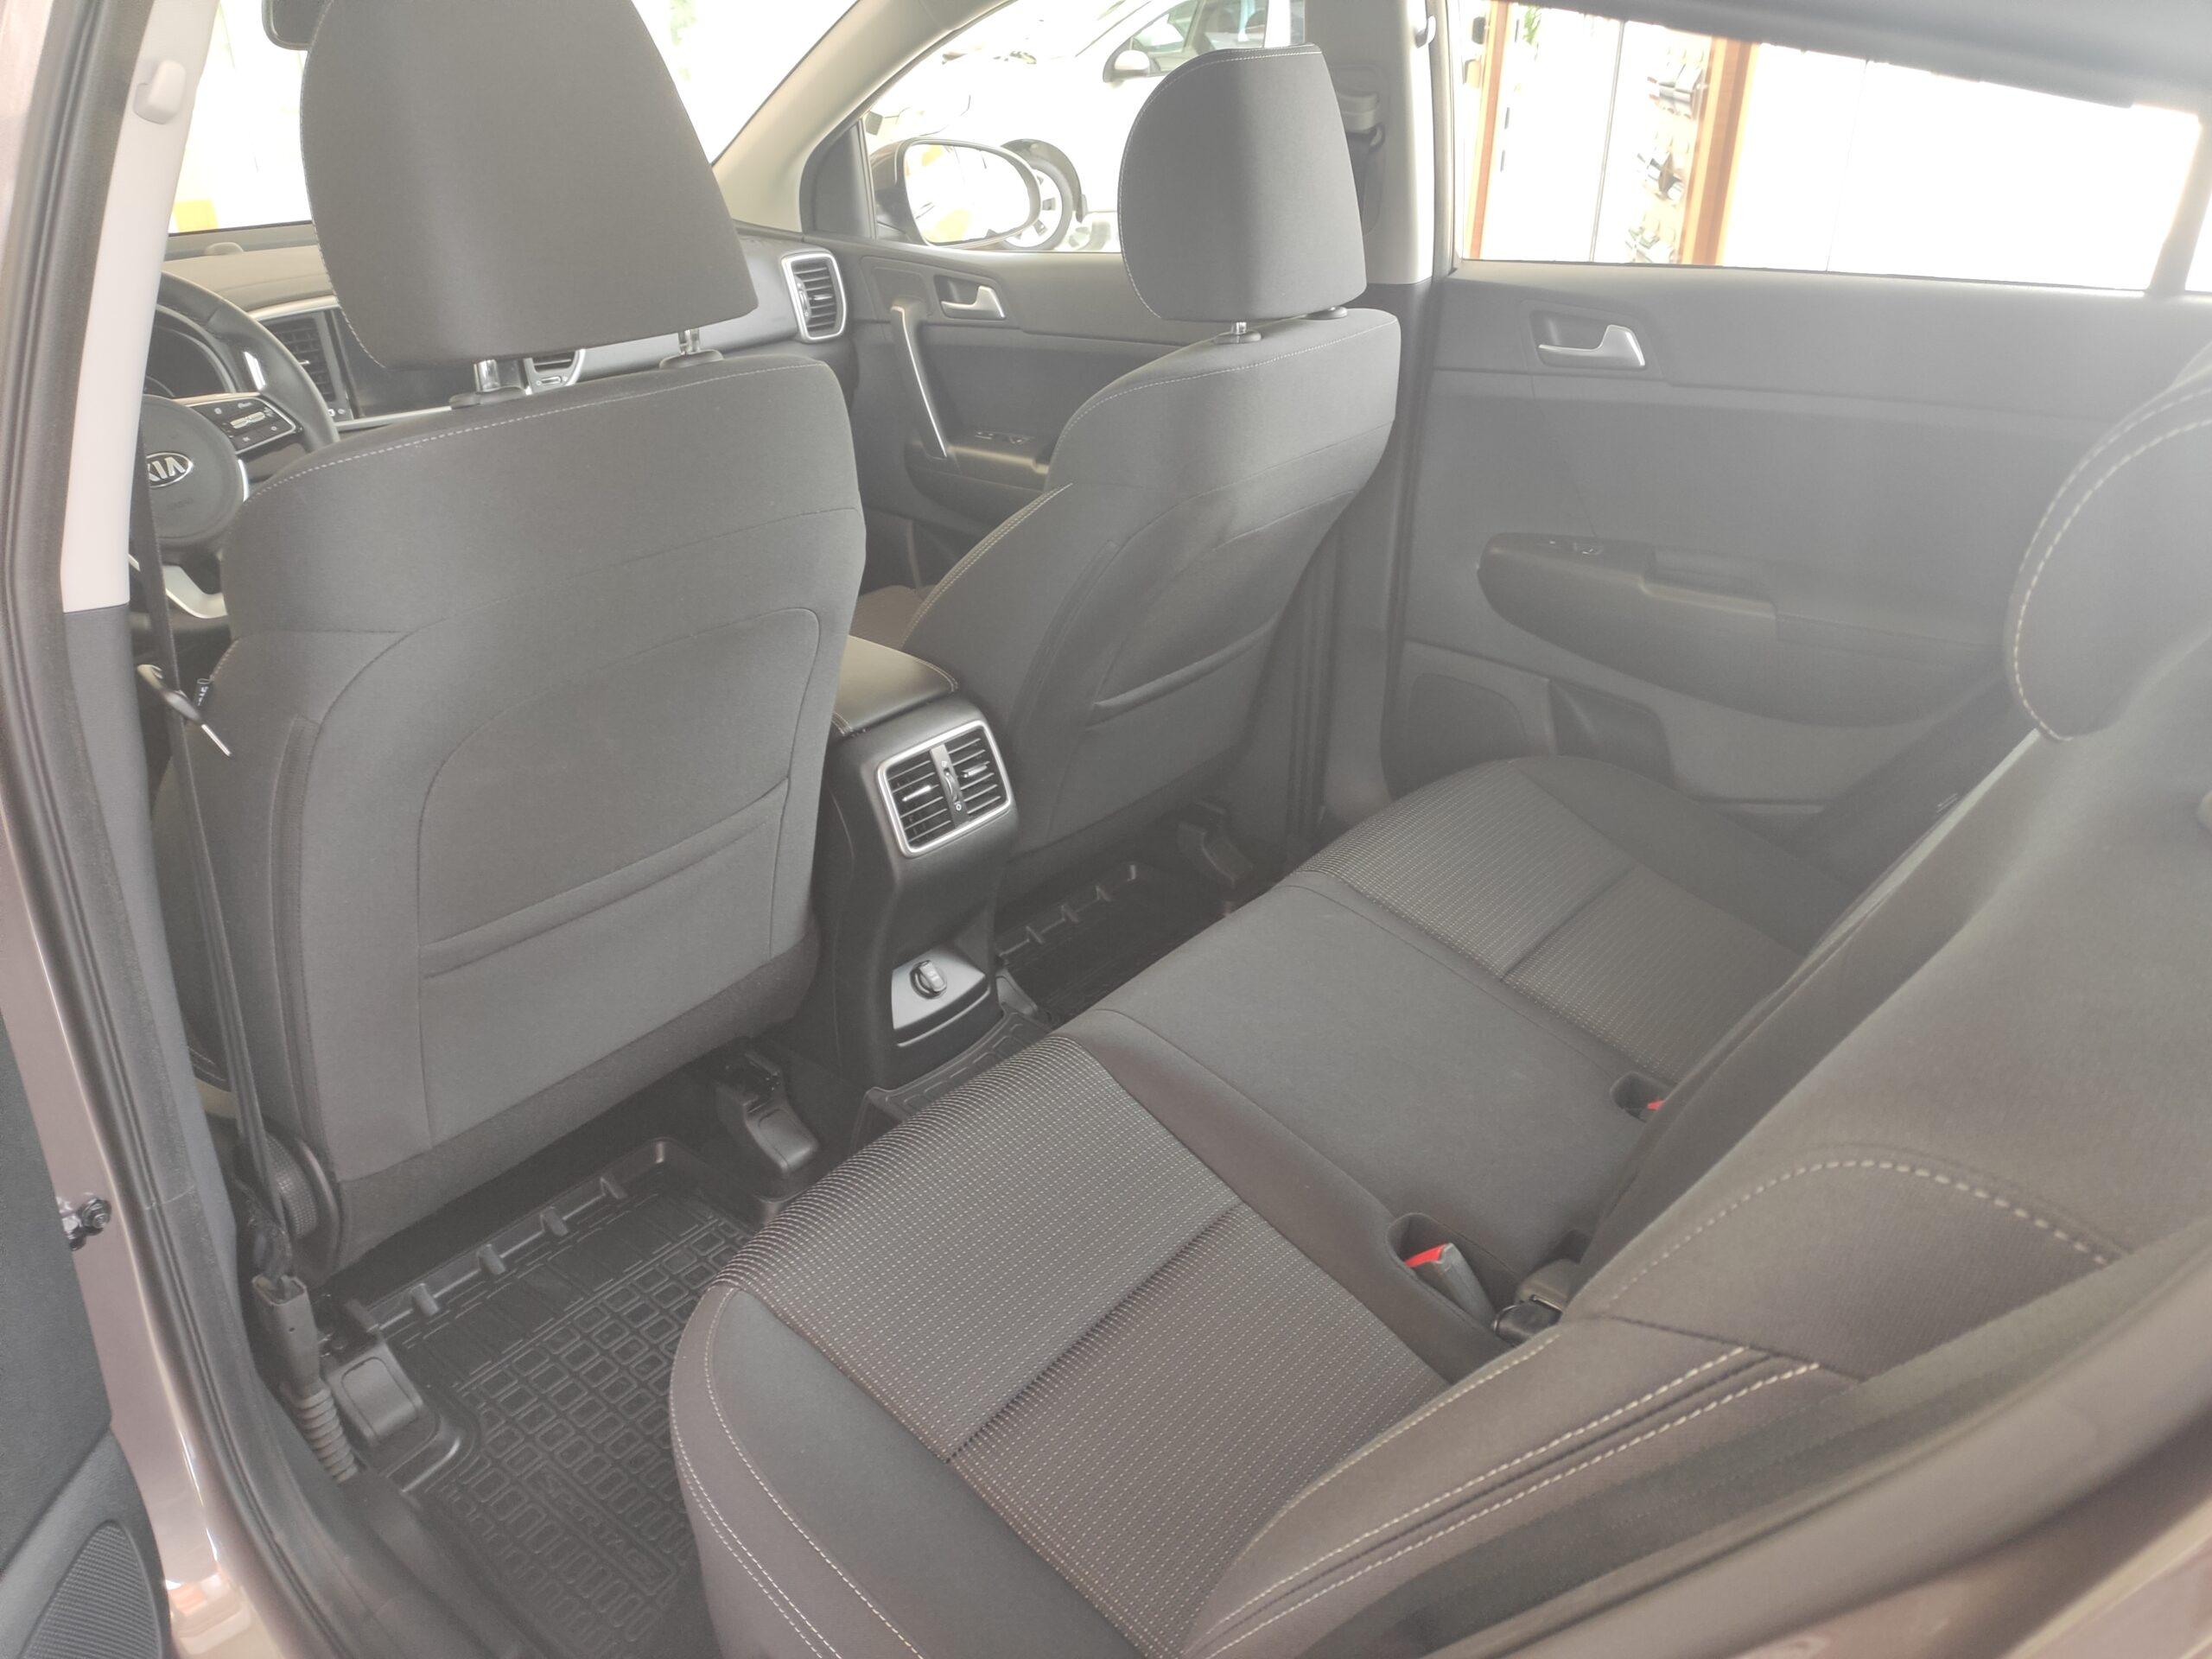 Kia Sportage 2.0 (150 л. c.), 6АТ. Привод передний, Luxe +. Коричневый. 2021